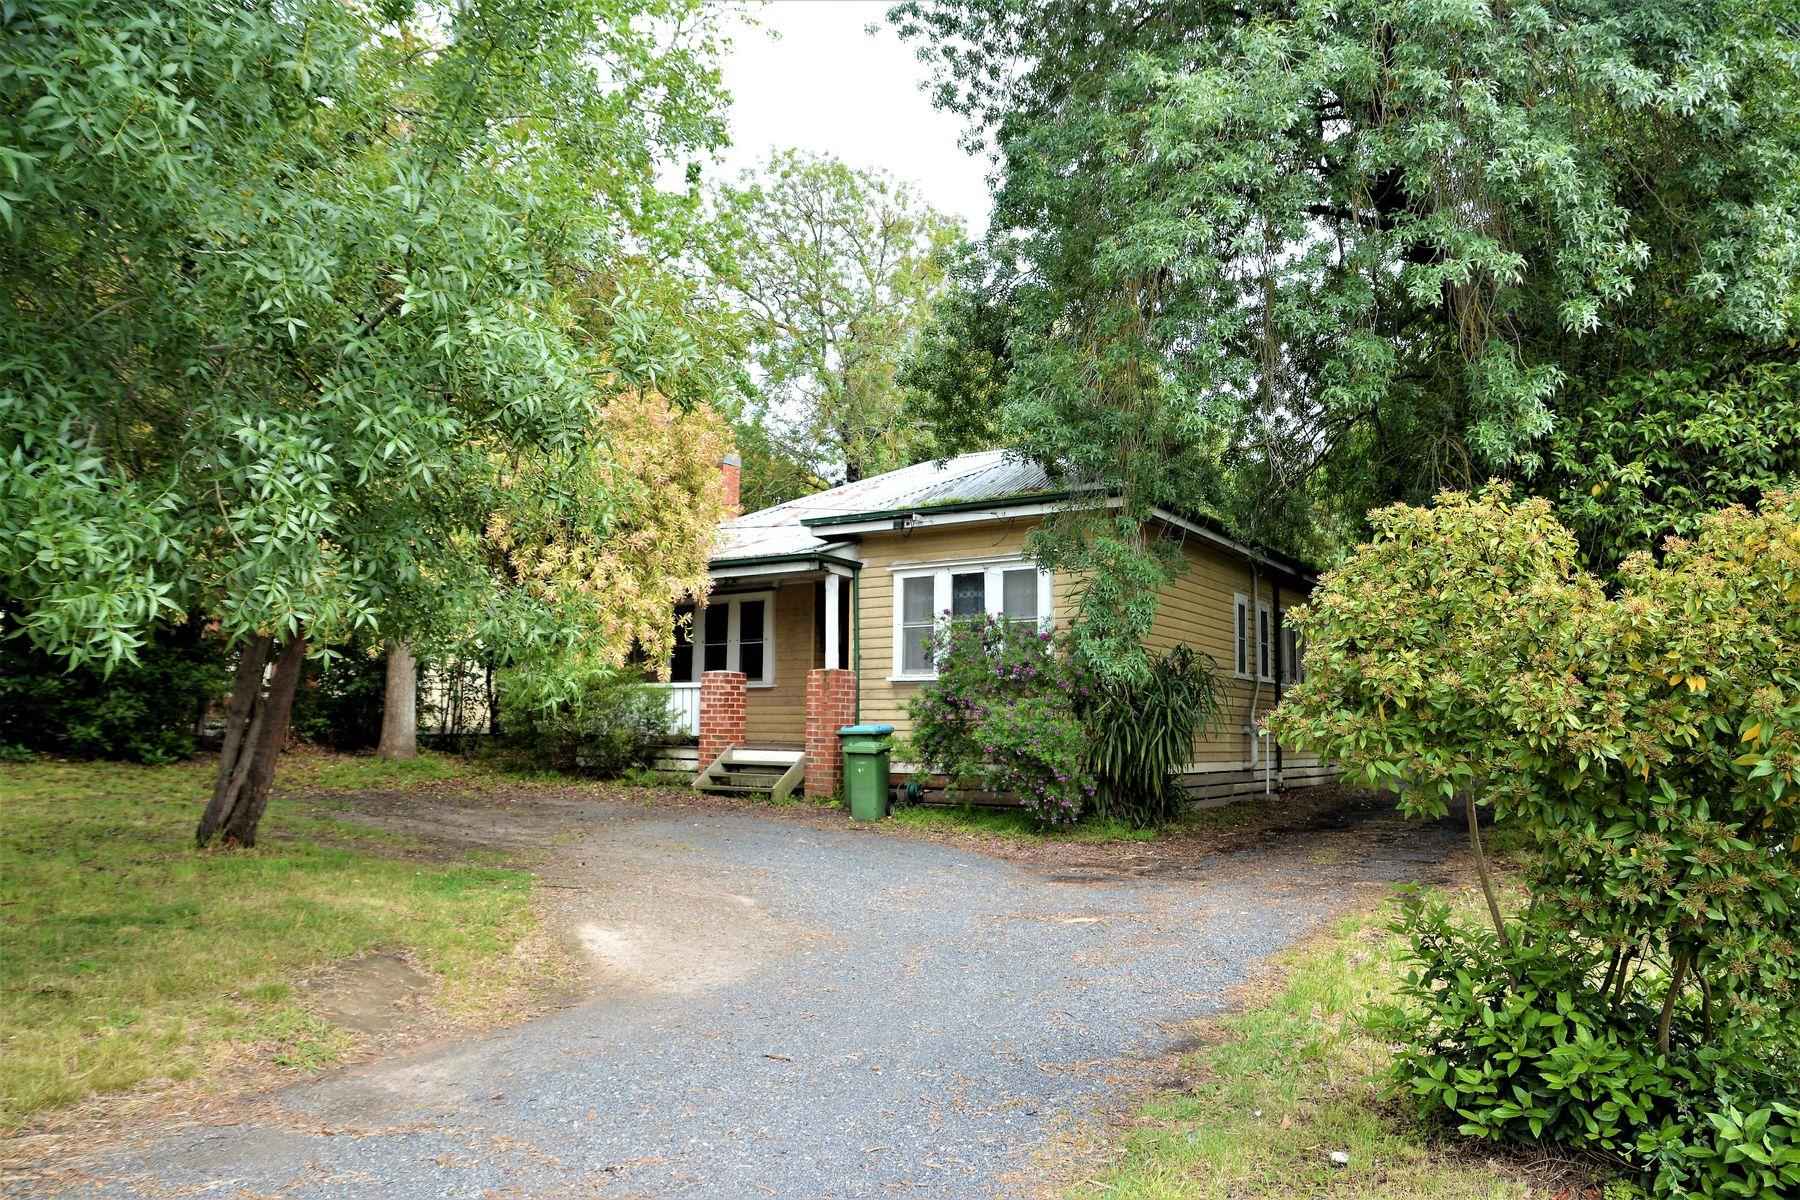 145 Mount Dandenong Road, Croydon, VIC 3136